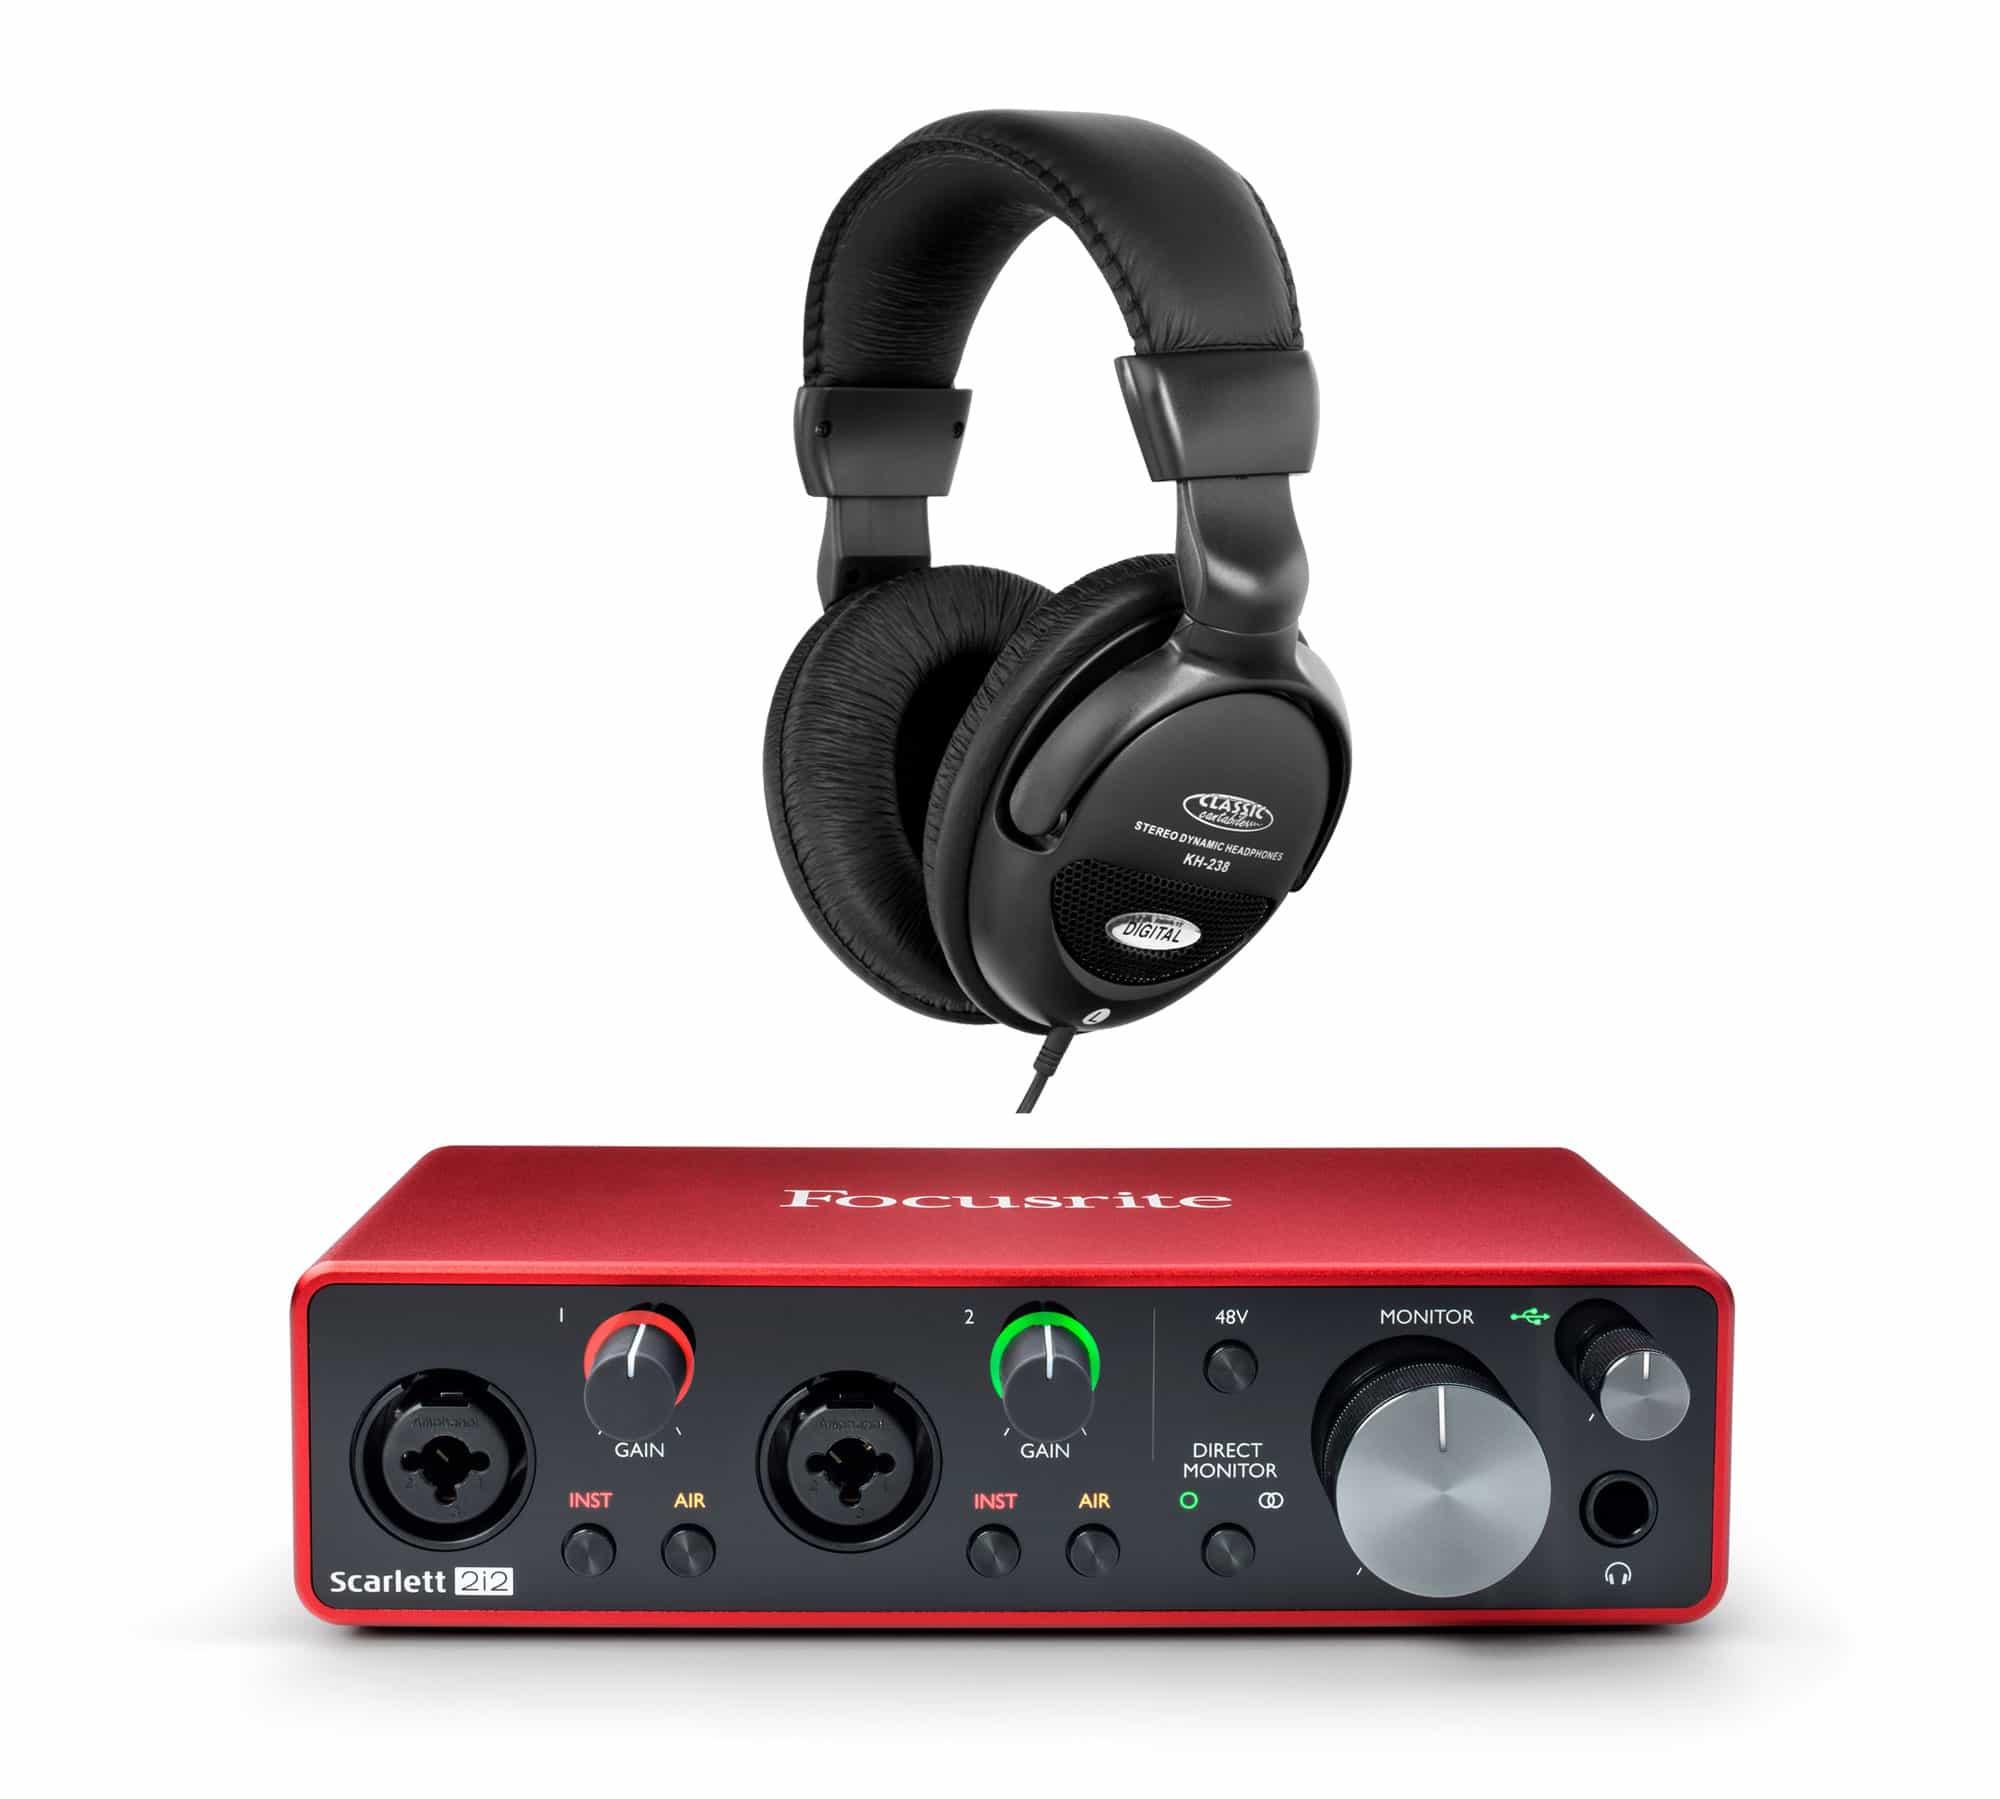 Focusrite Scarlett 2i2 USB Audio Interface Set